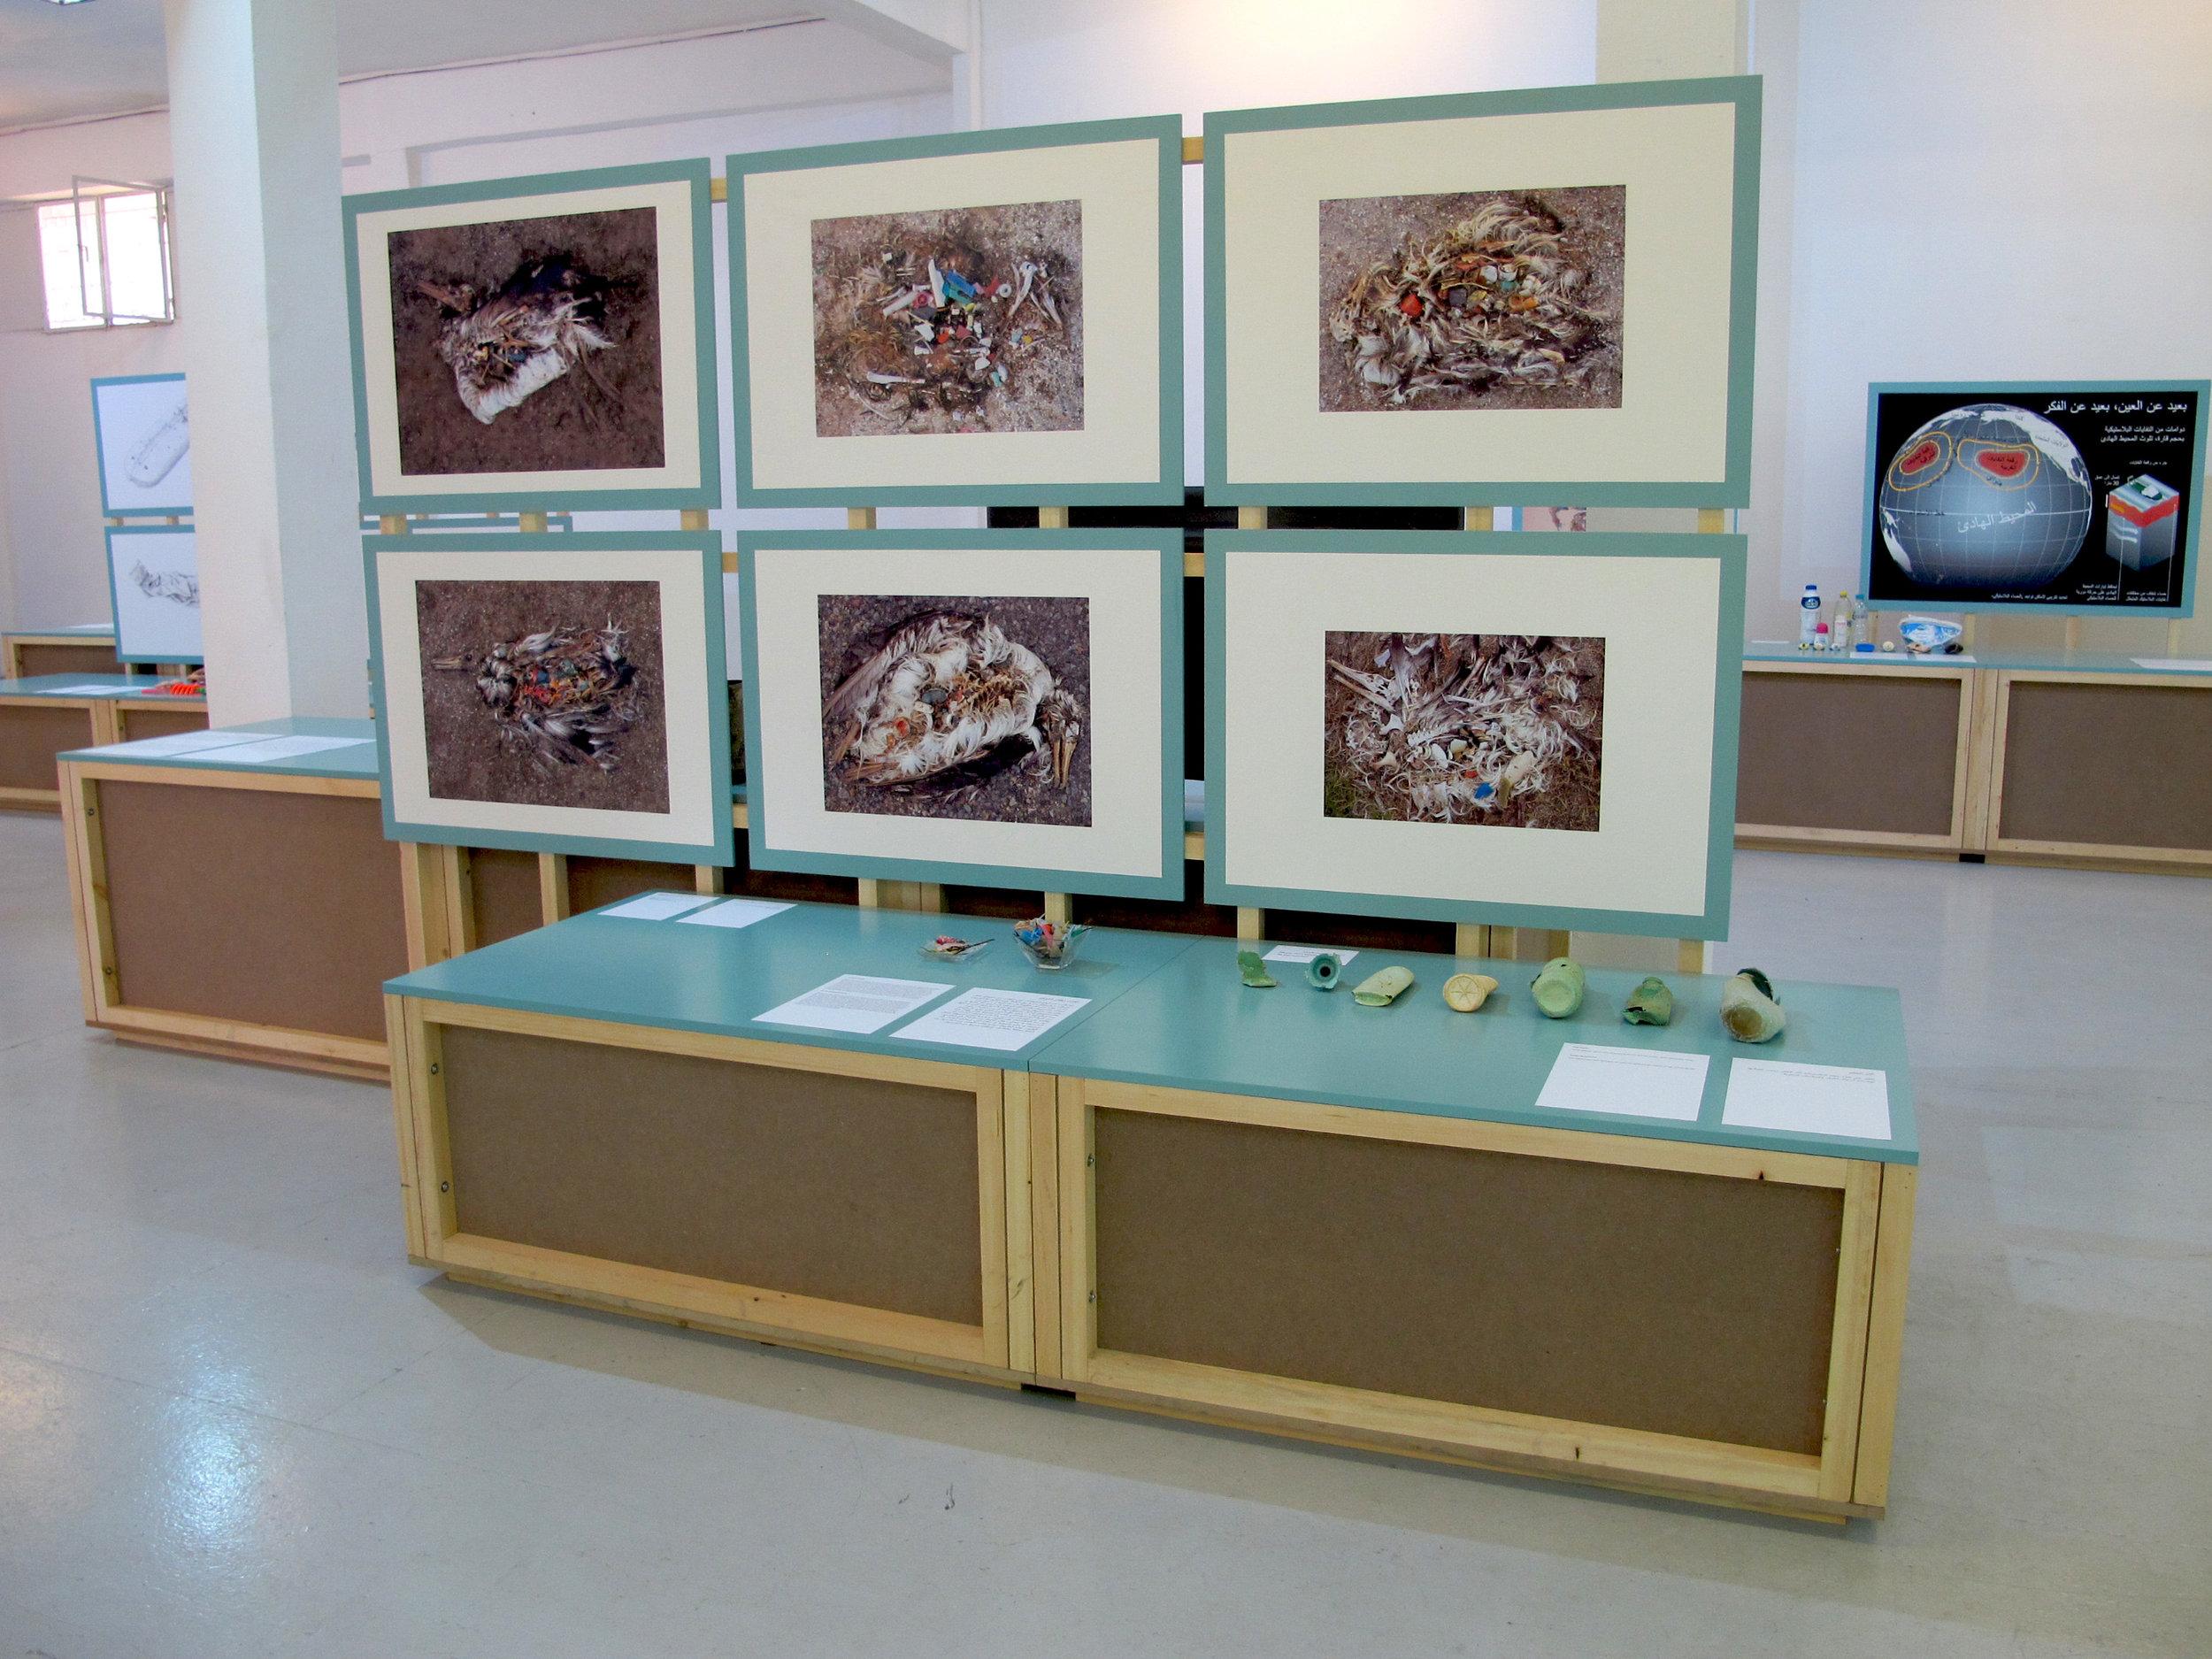 Exhibition_Lebanon_8.JPG